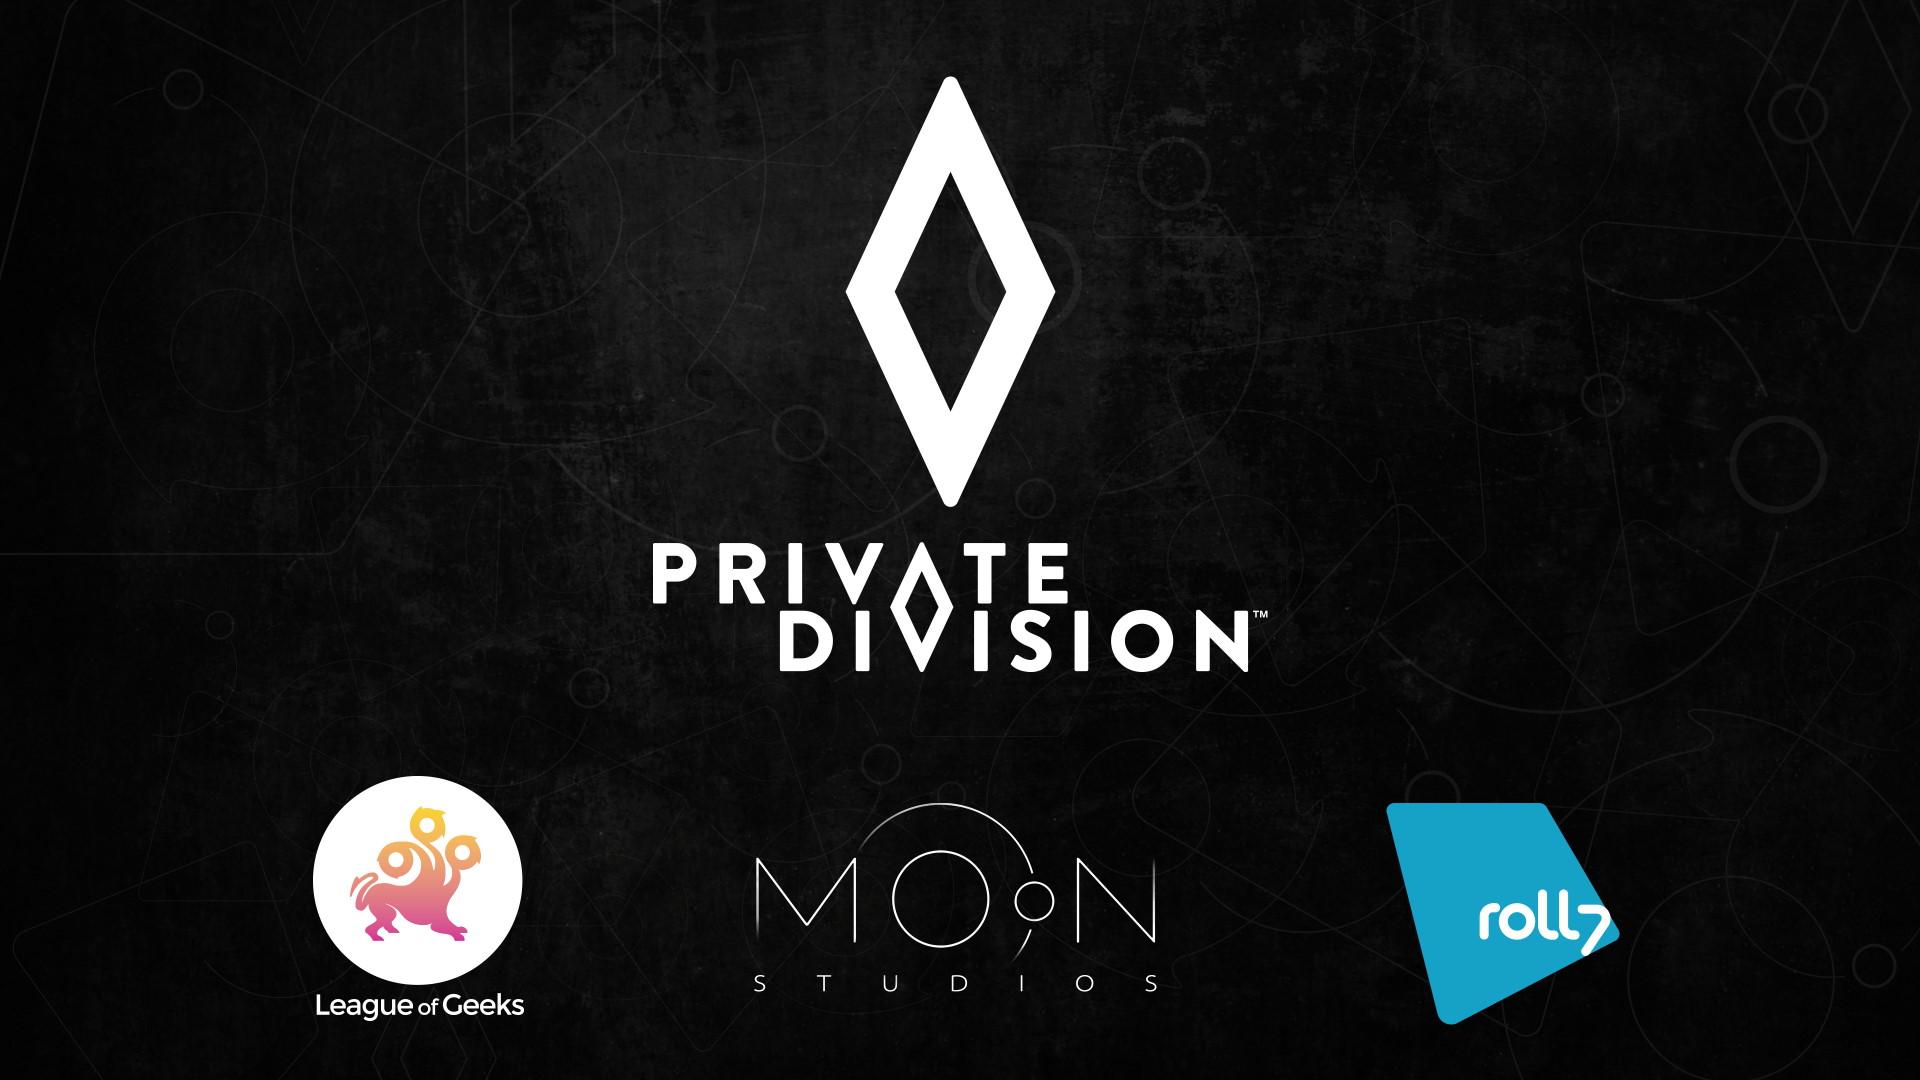 private division moon studios